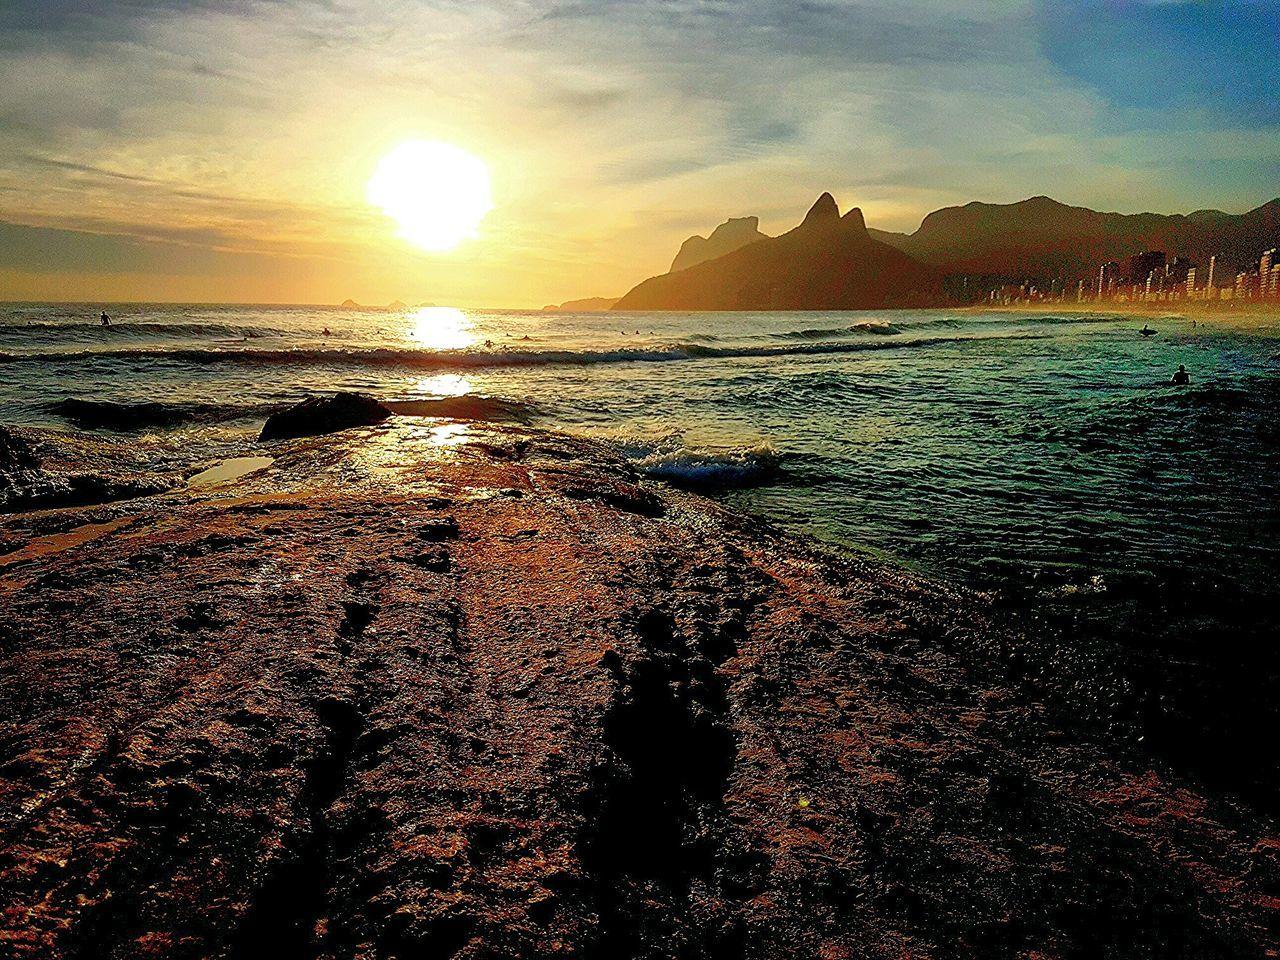 Sunset Sunset Sun Sky Sunlight Nature Beauty In Nature Sea Beach No People Day Water Ipanema Beach Arpoador